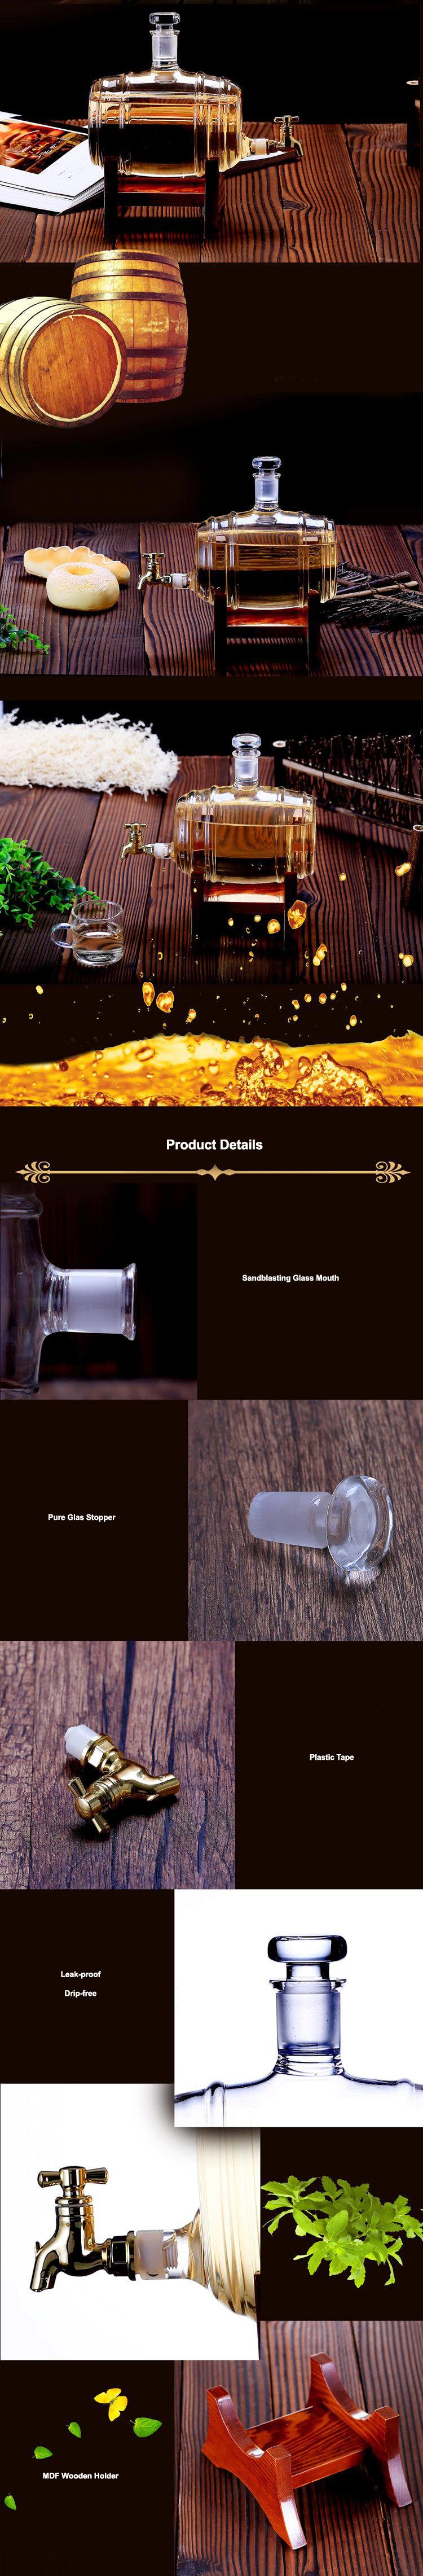 glass-decanter-barrel-wine.jpg